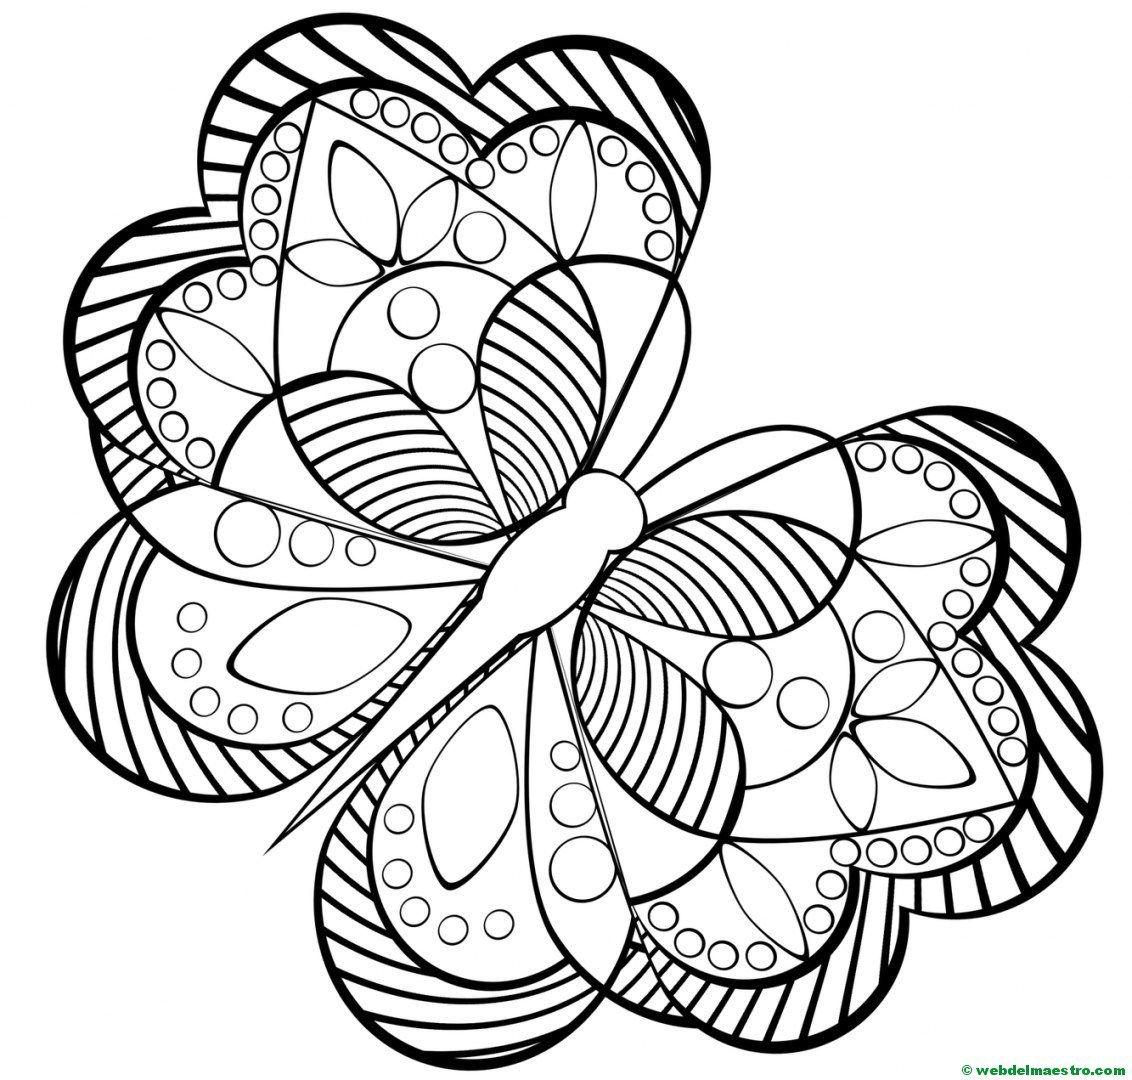 Dibujos antiestrés | Mariposas, Dibujo y Preescolar